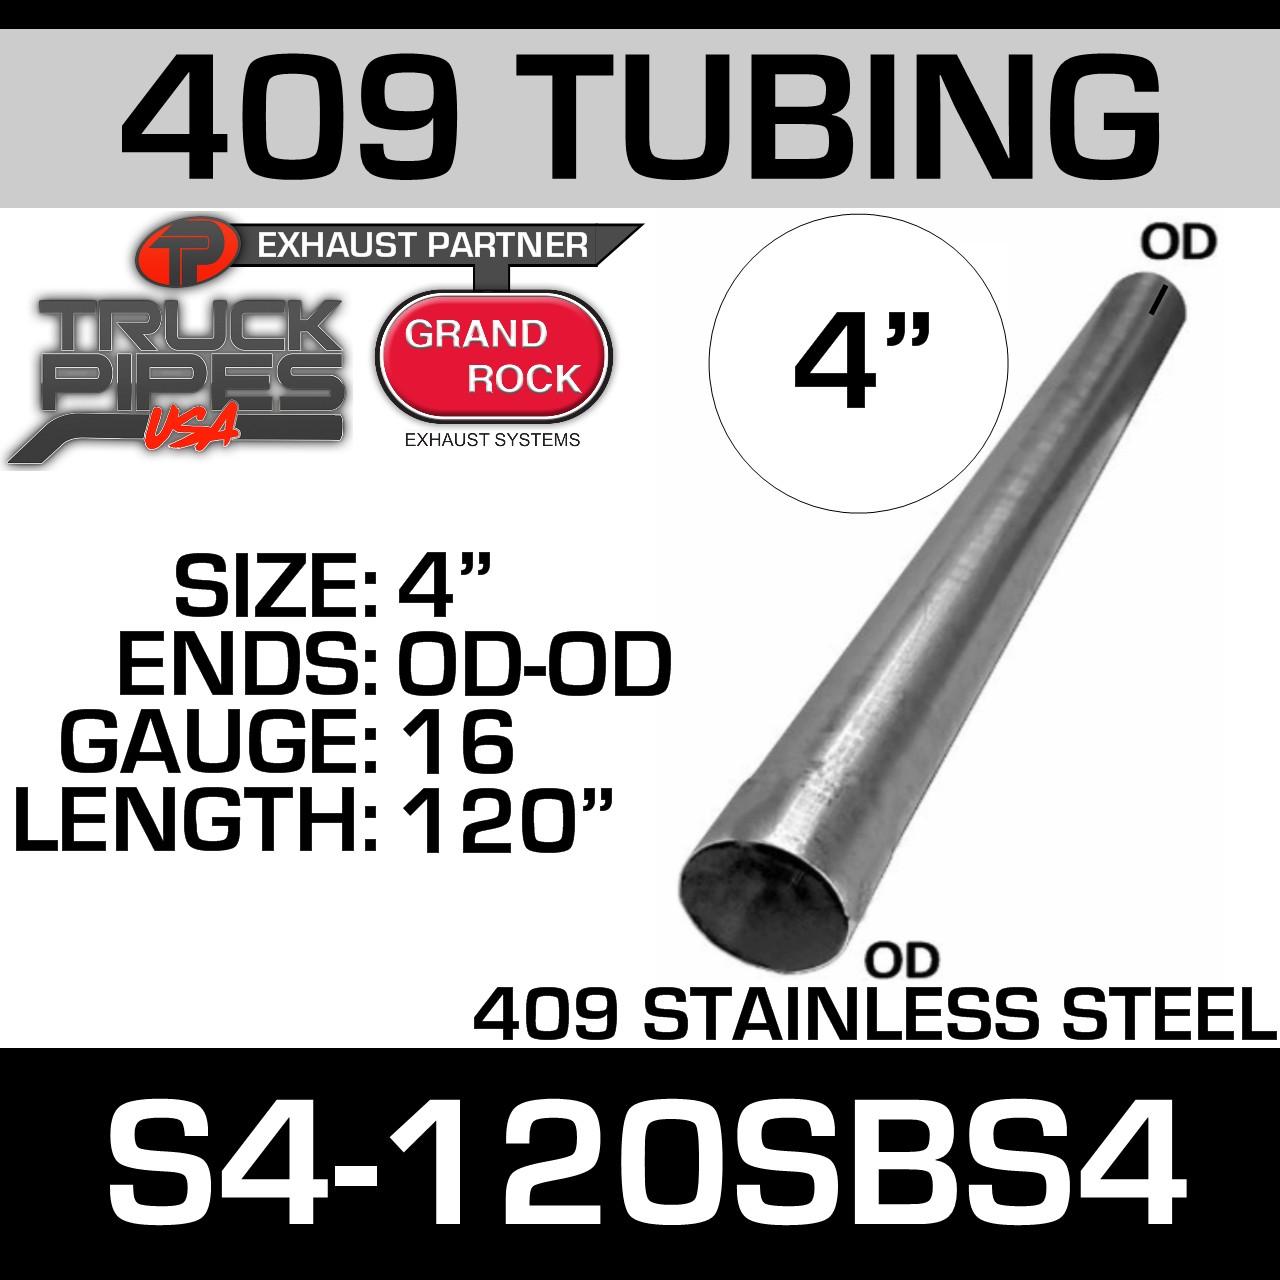 s4-120sbs4-409-steel-exhaust-tubing-4-inch-diameter-od-end-120-inches-long.jpg